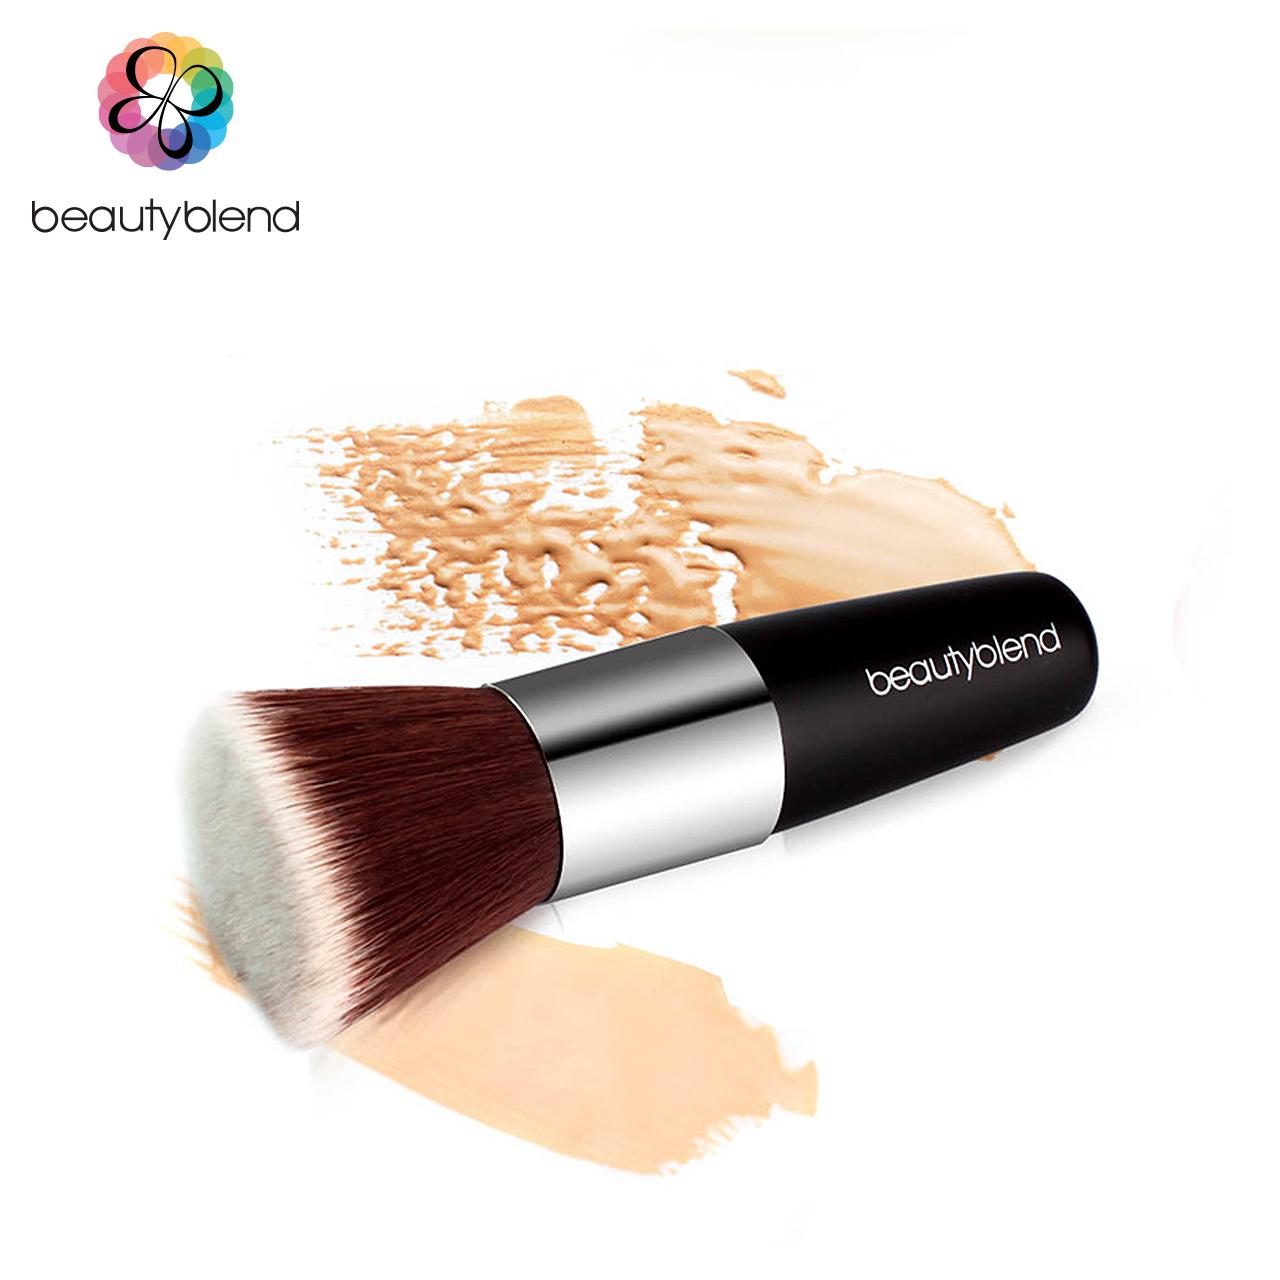 Белл плоский плоский заложил фундамент кисти румяна макияж кисть инструмент кисть для рисования макияжа косметические кисти